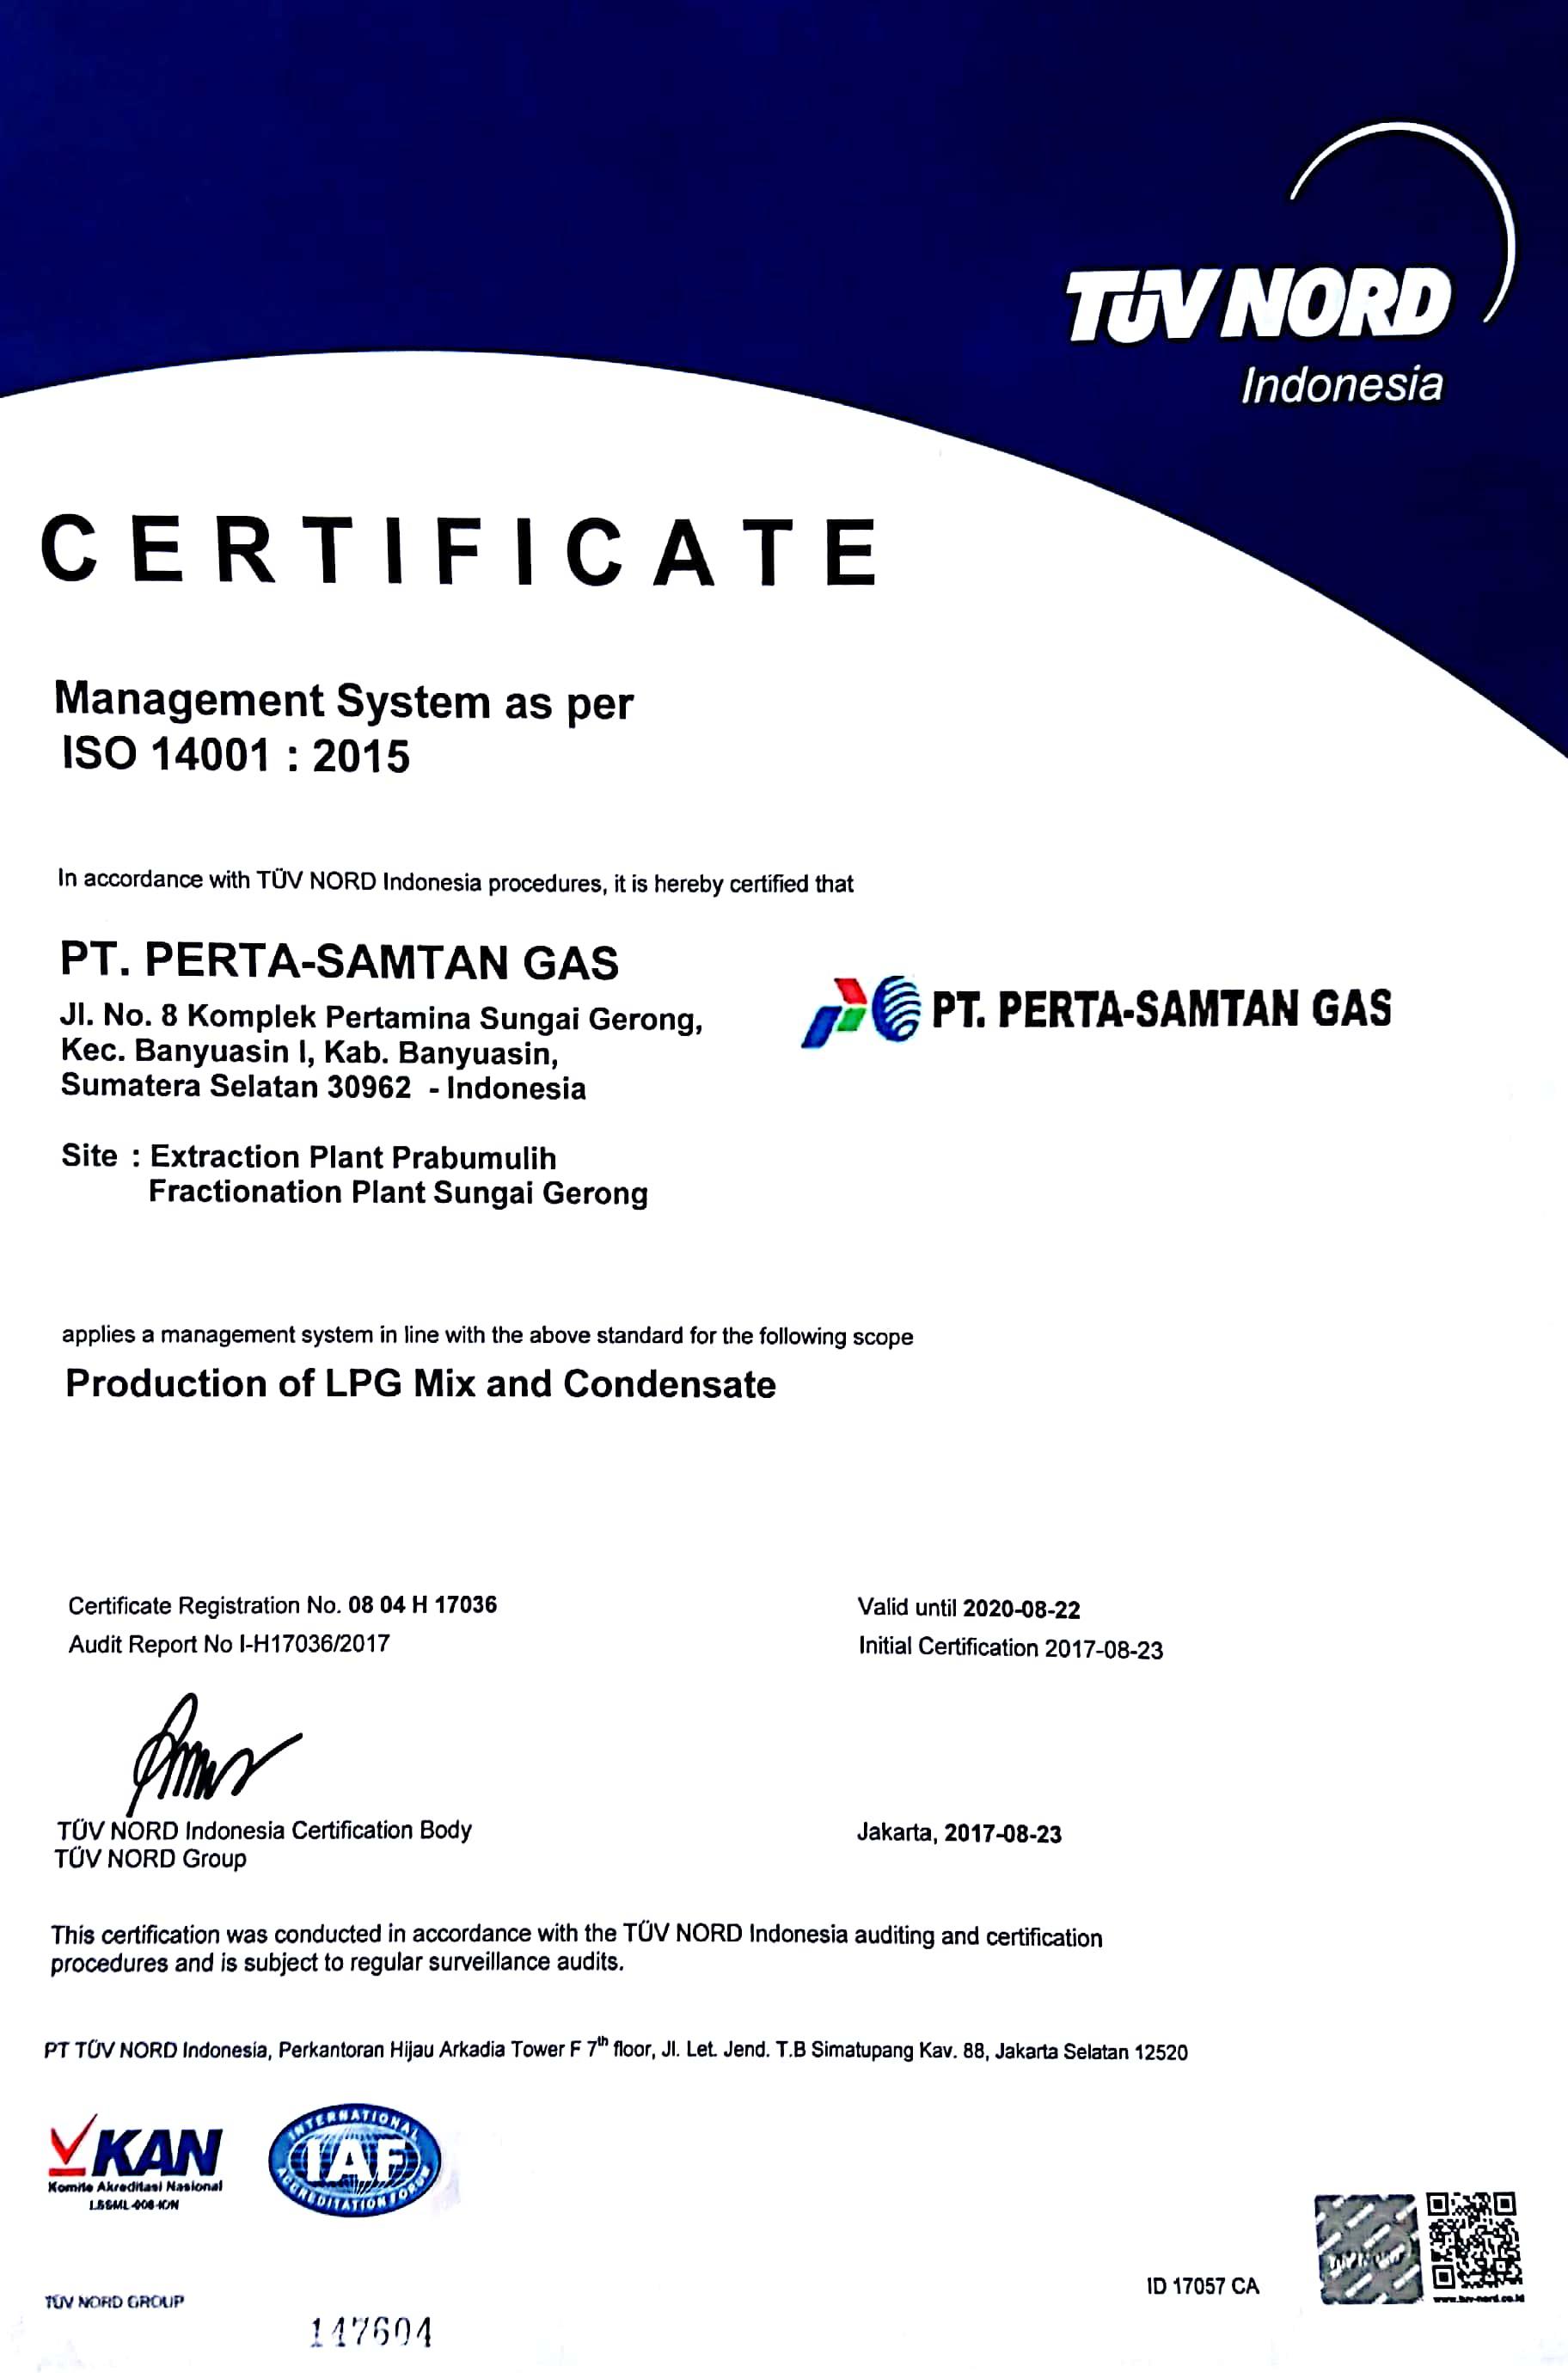 Pt Perta Samtan Gas Management System As Per Iso 140012015